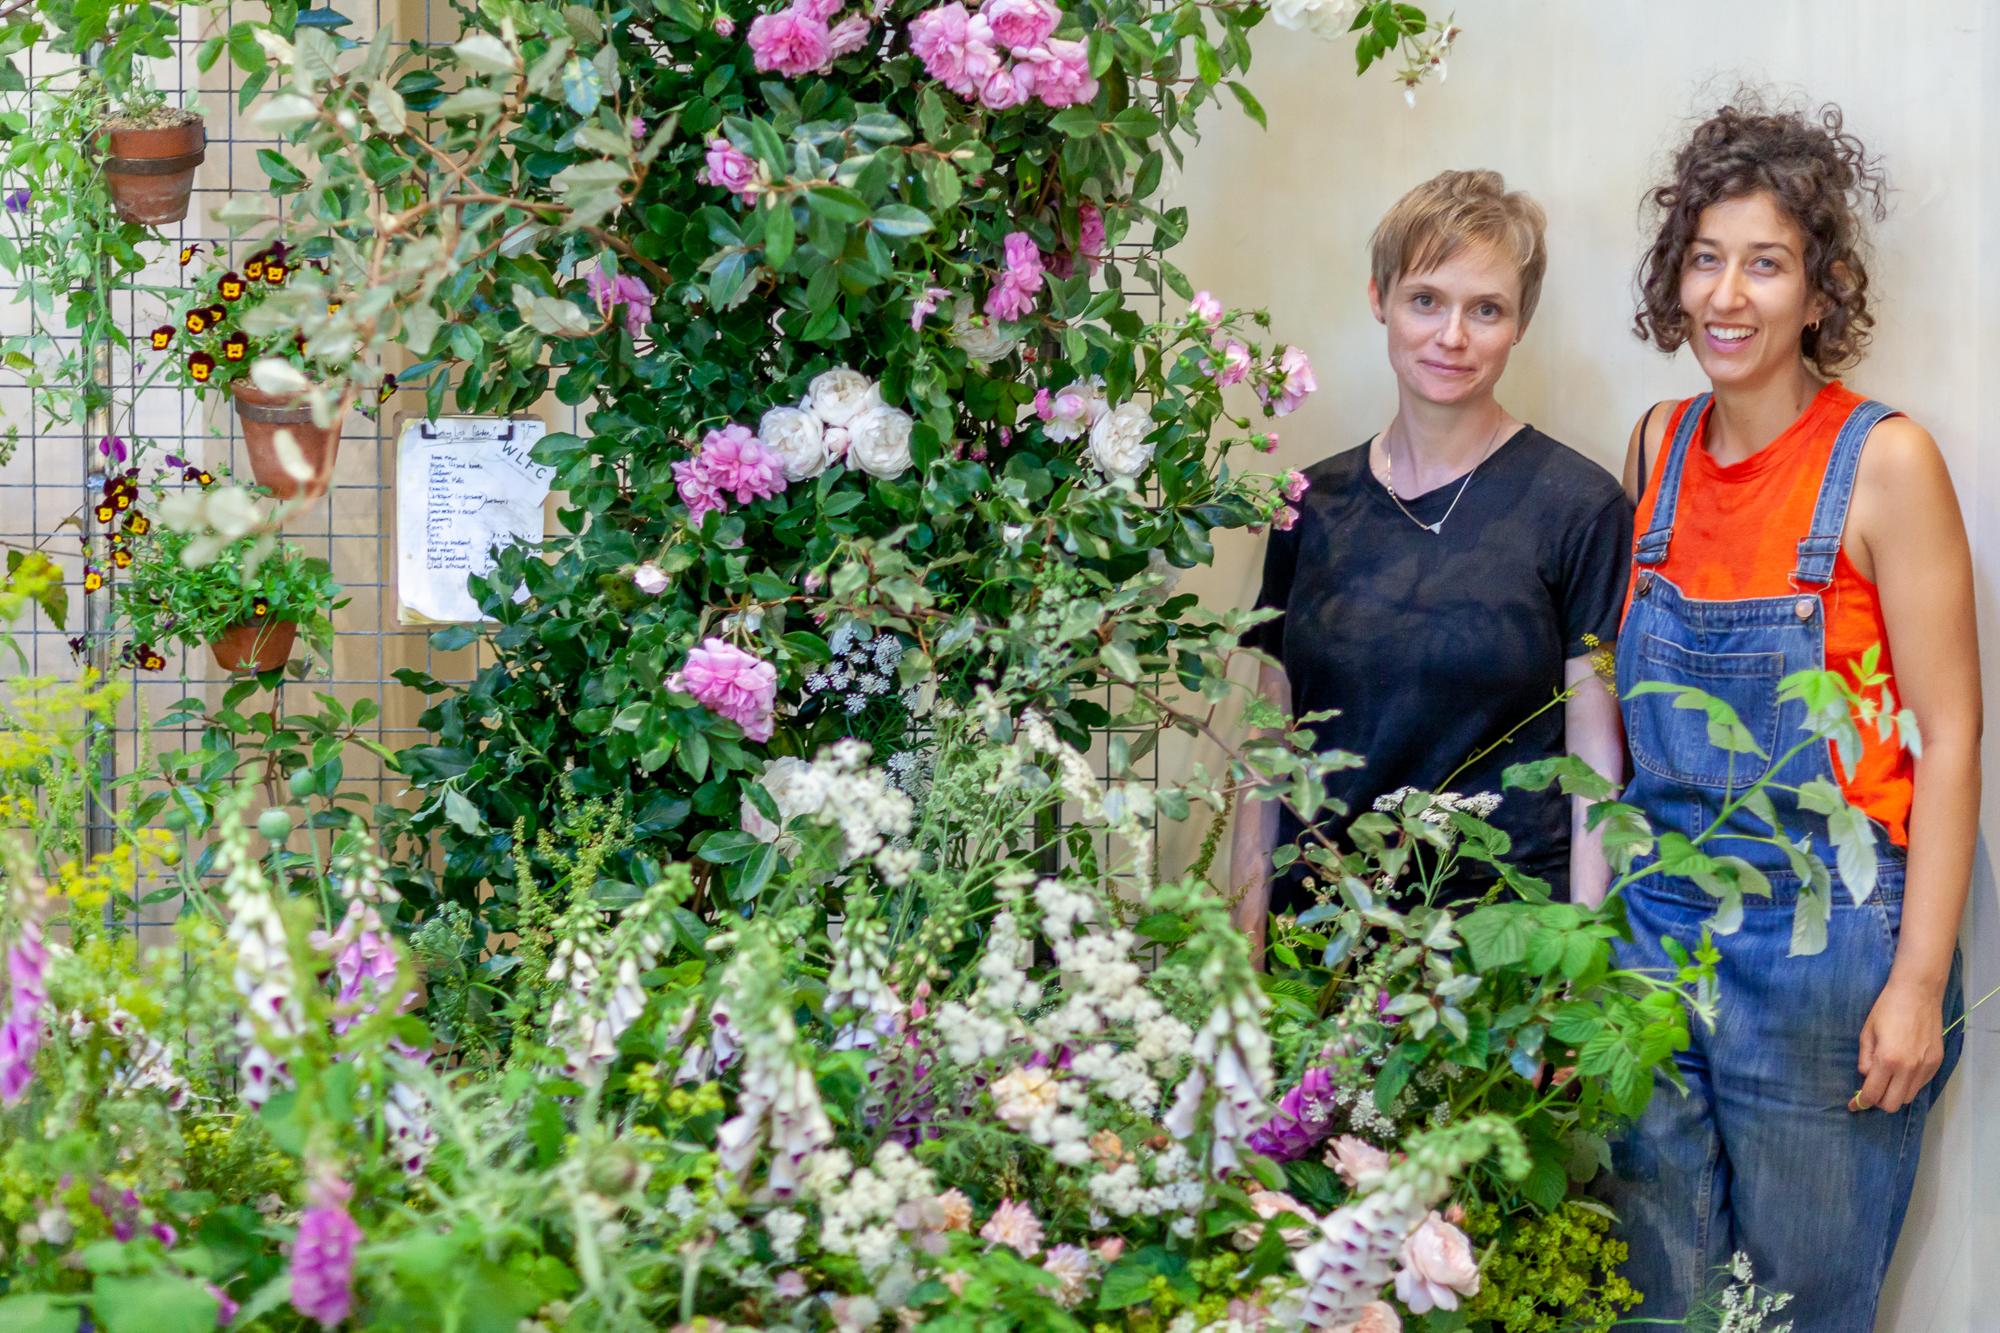 Wolves-Lane-Flower-Company-installation-British-Flowers-Week-2018-at-Garden-Museum-by-New-Covent-Garden-Market (6).jpg